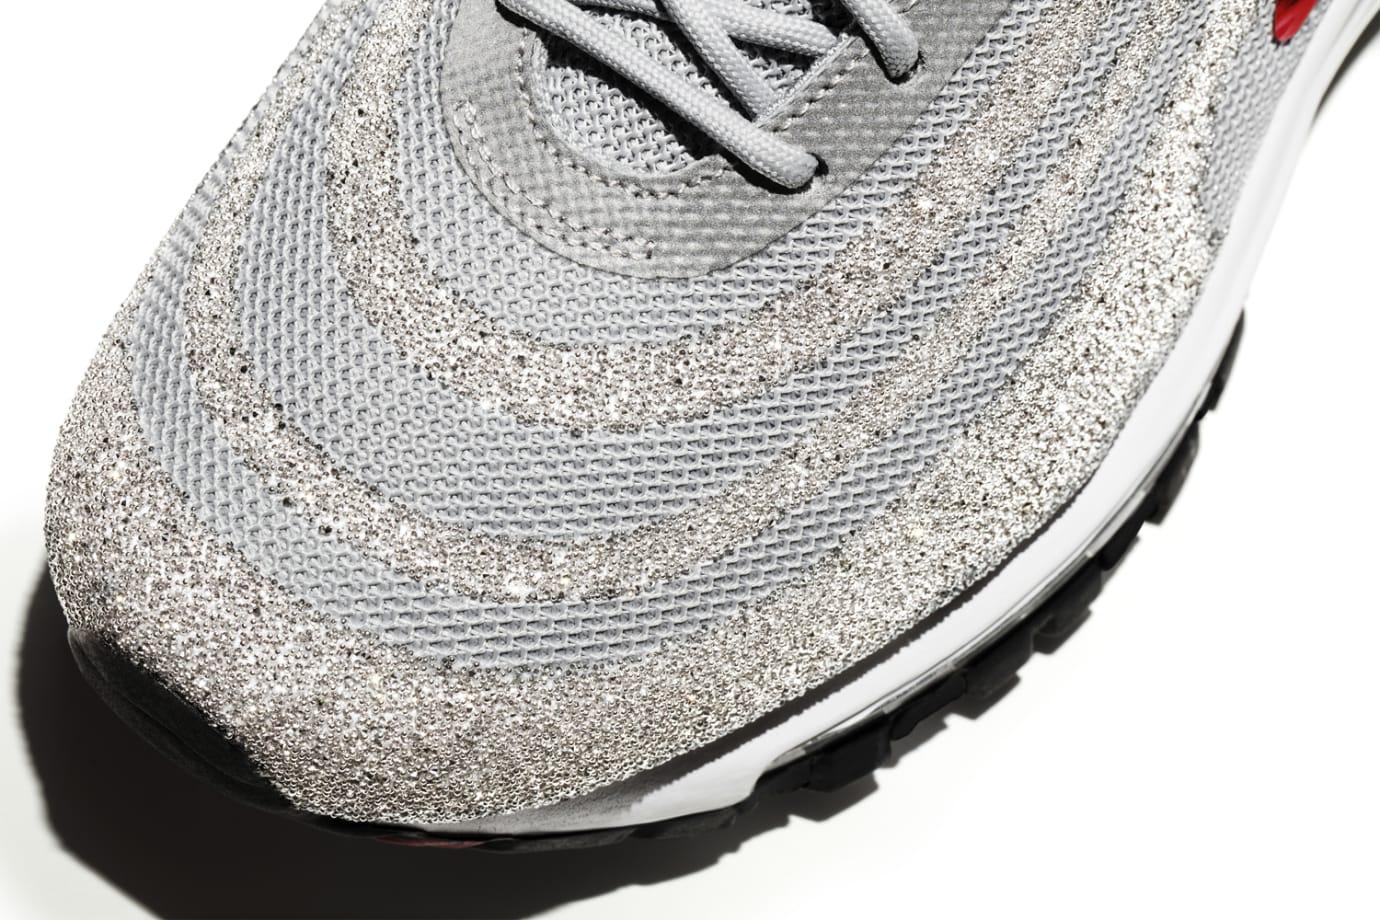 Nike Air Max 97 Swarovski Crystal Silver Toe